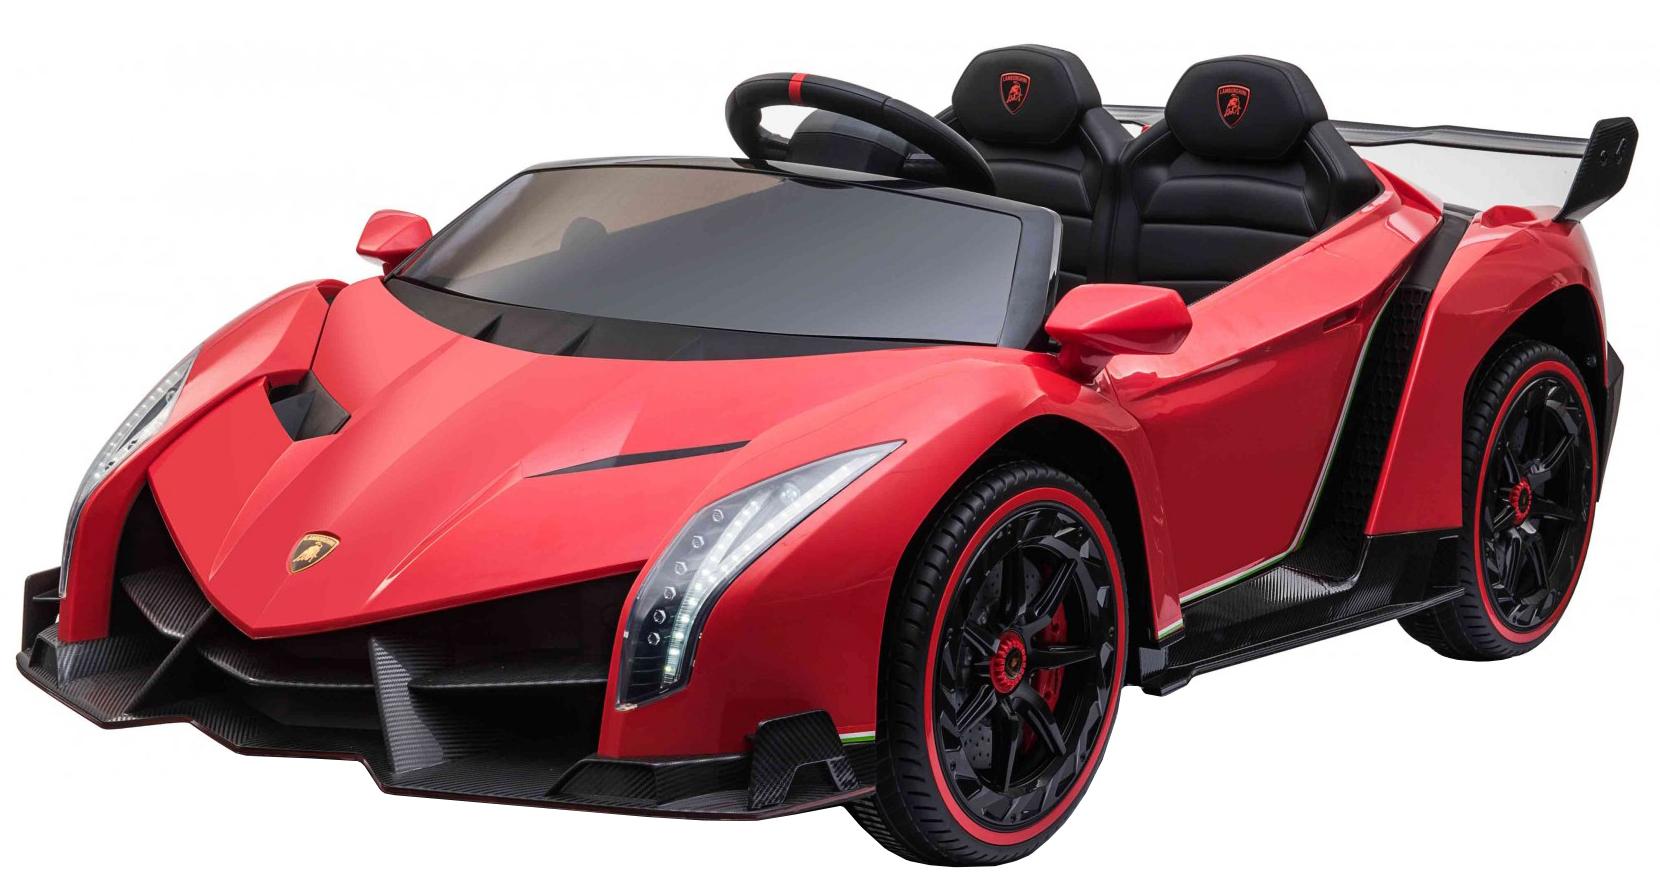 Masinuta electrica 4 x 4 Premier Lamborghini Veneno, 12V, roti cauciuc EVA, scaun piele ecologica, rosu